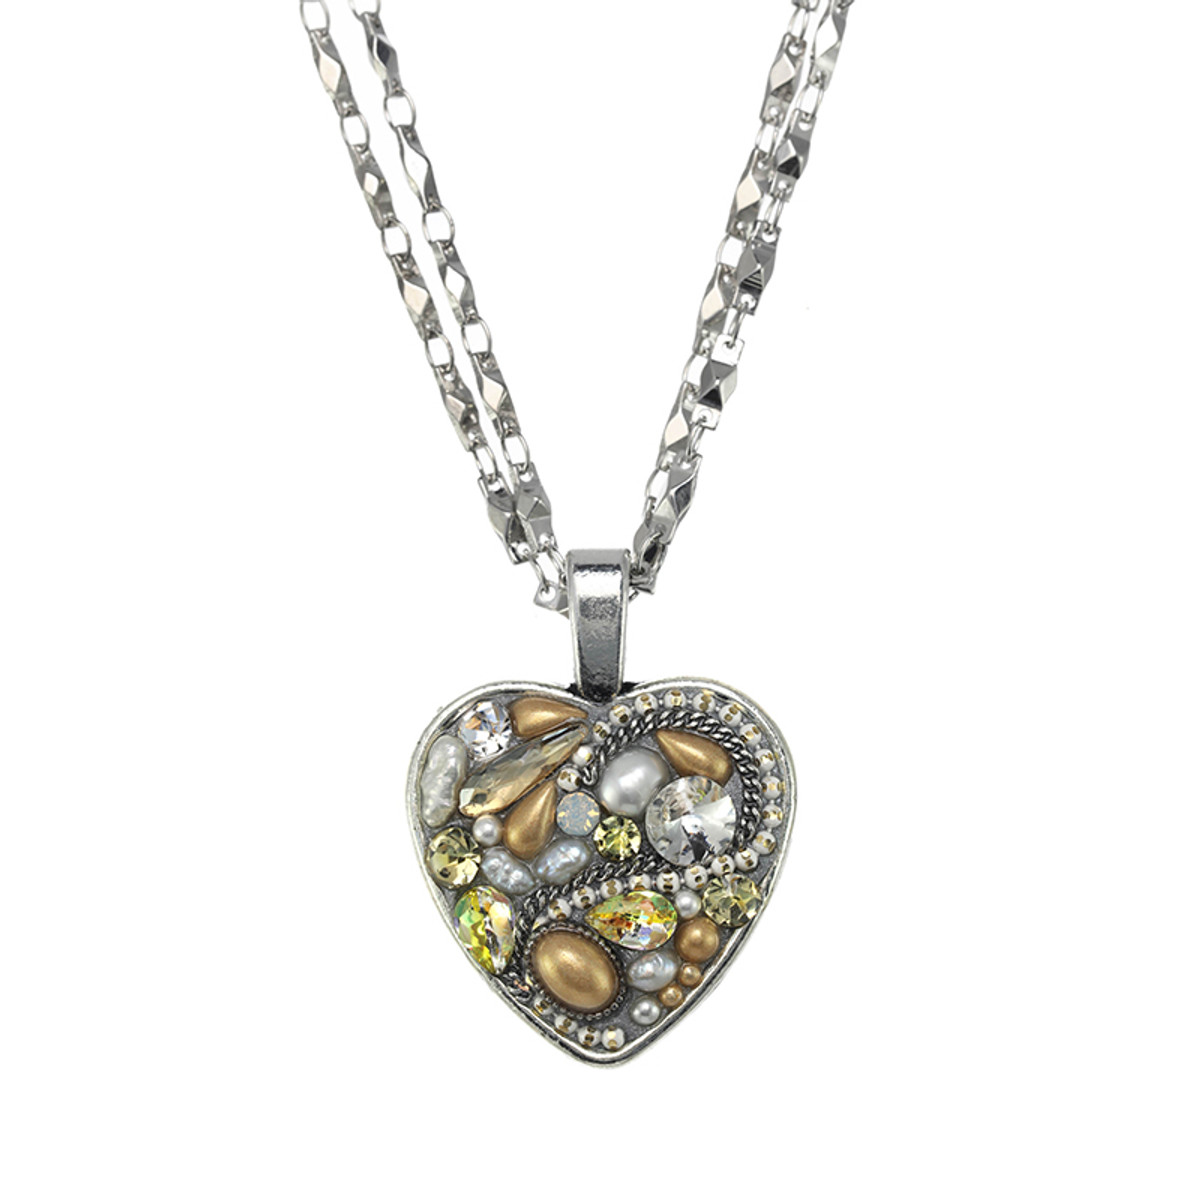 Michal Golan Moonlight Heart Necklace